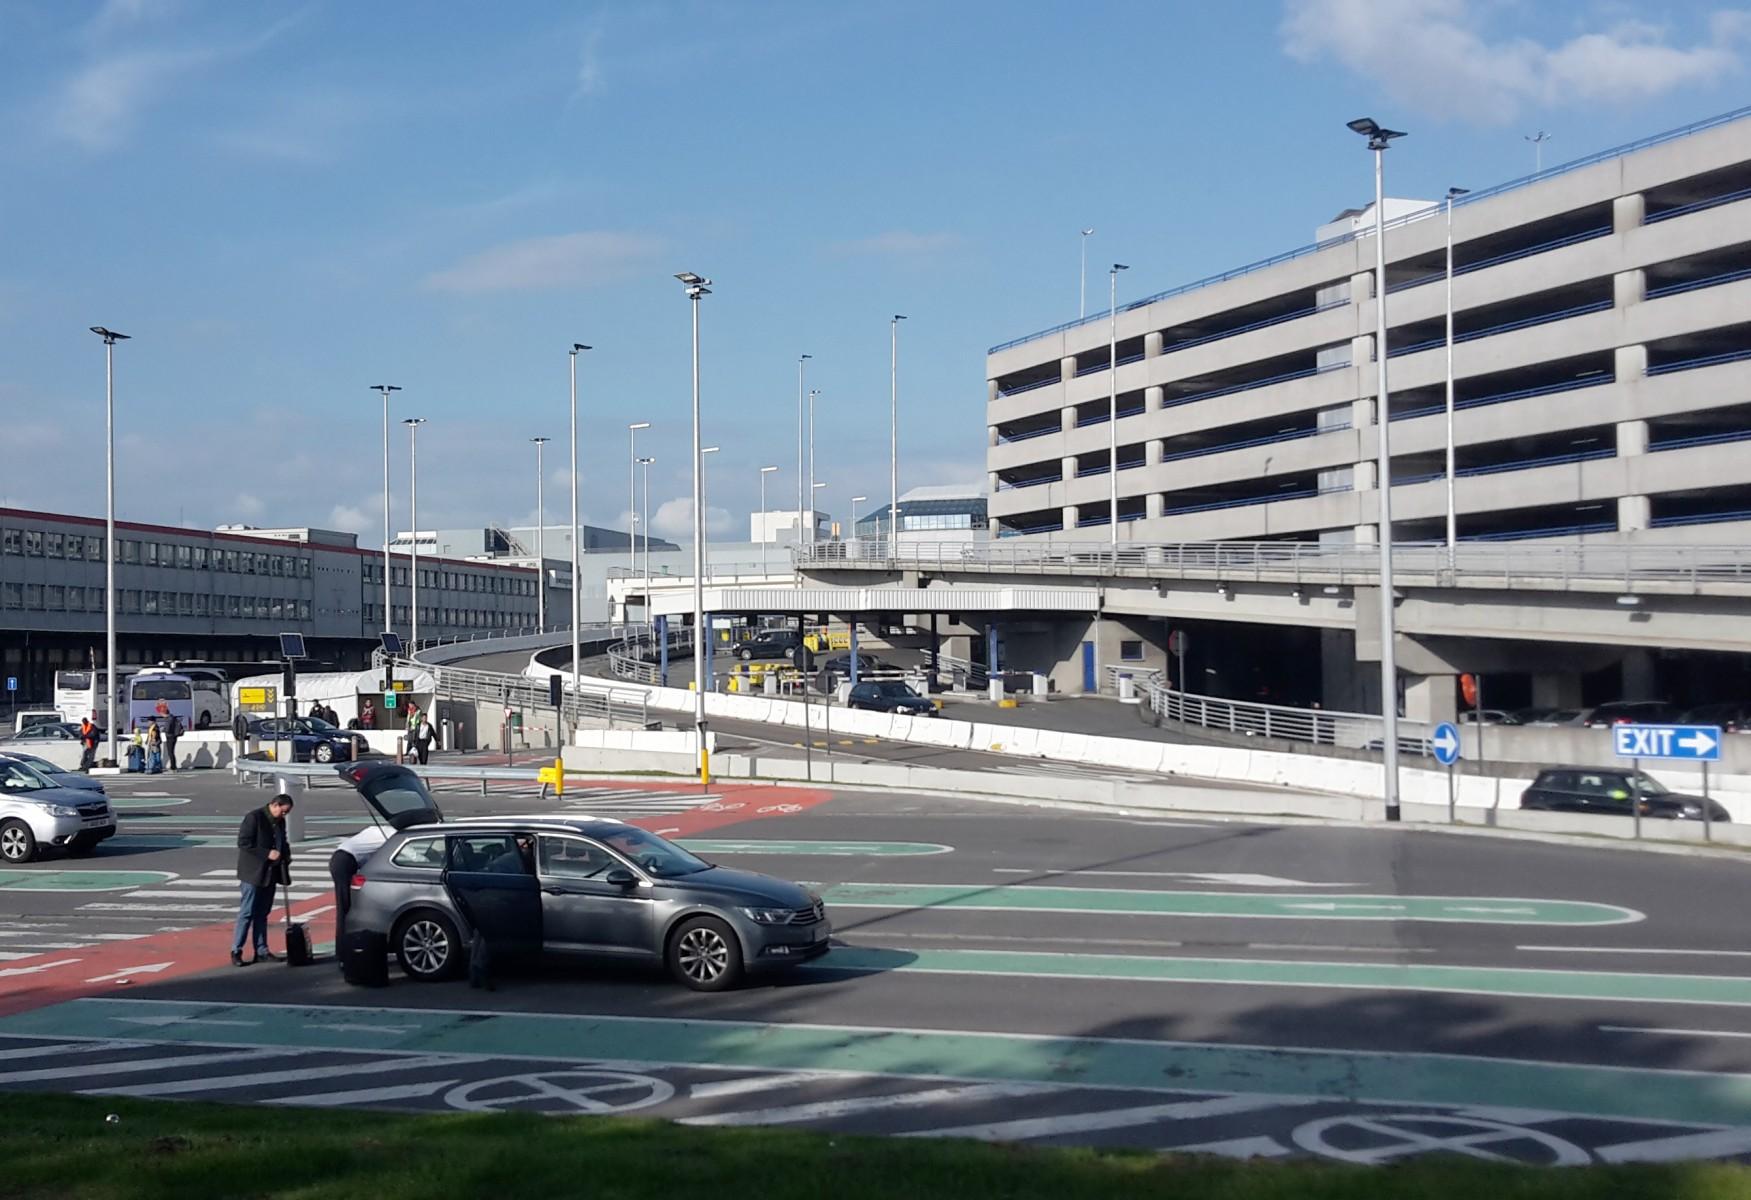 brussels airport expands passenger drop off area. Black Bedroom Furniture Sets. Home Design Ideas